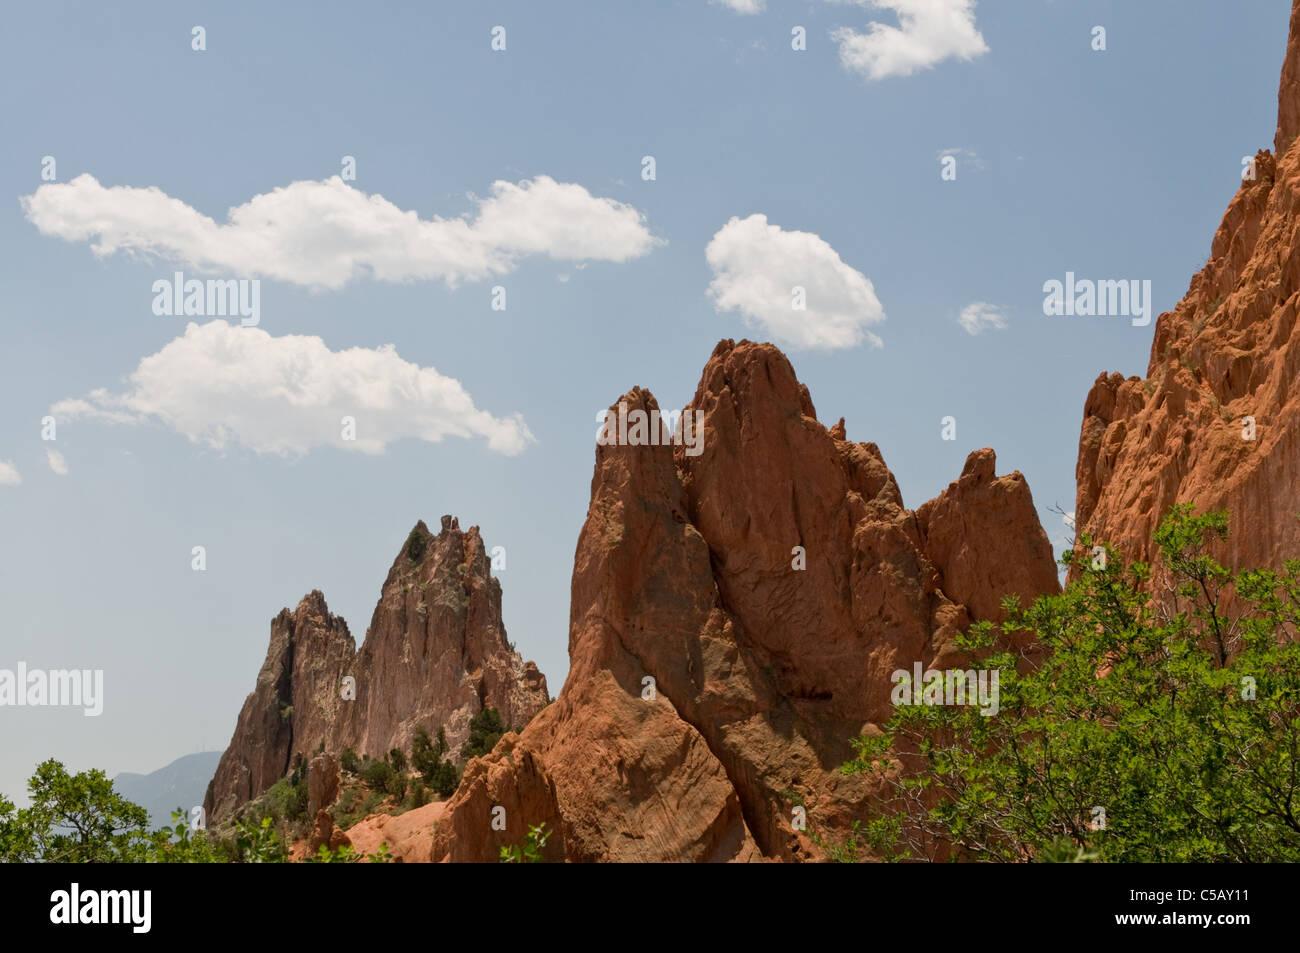 USA, Colorado, Colorado Springs, Garden of the Gods, rock formations - Stock Image